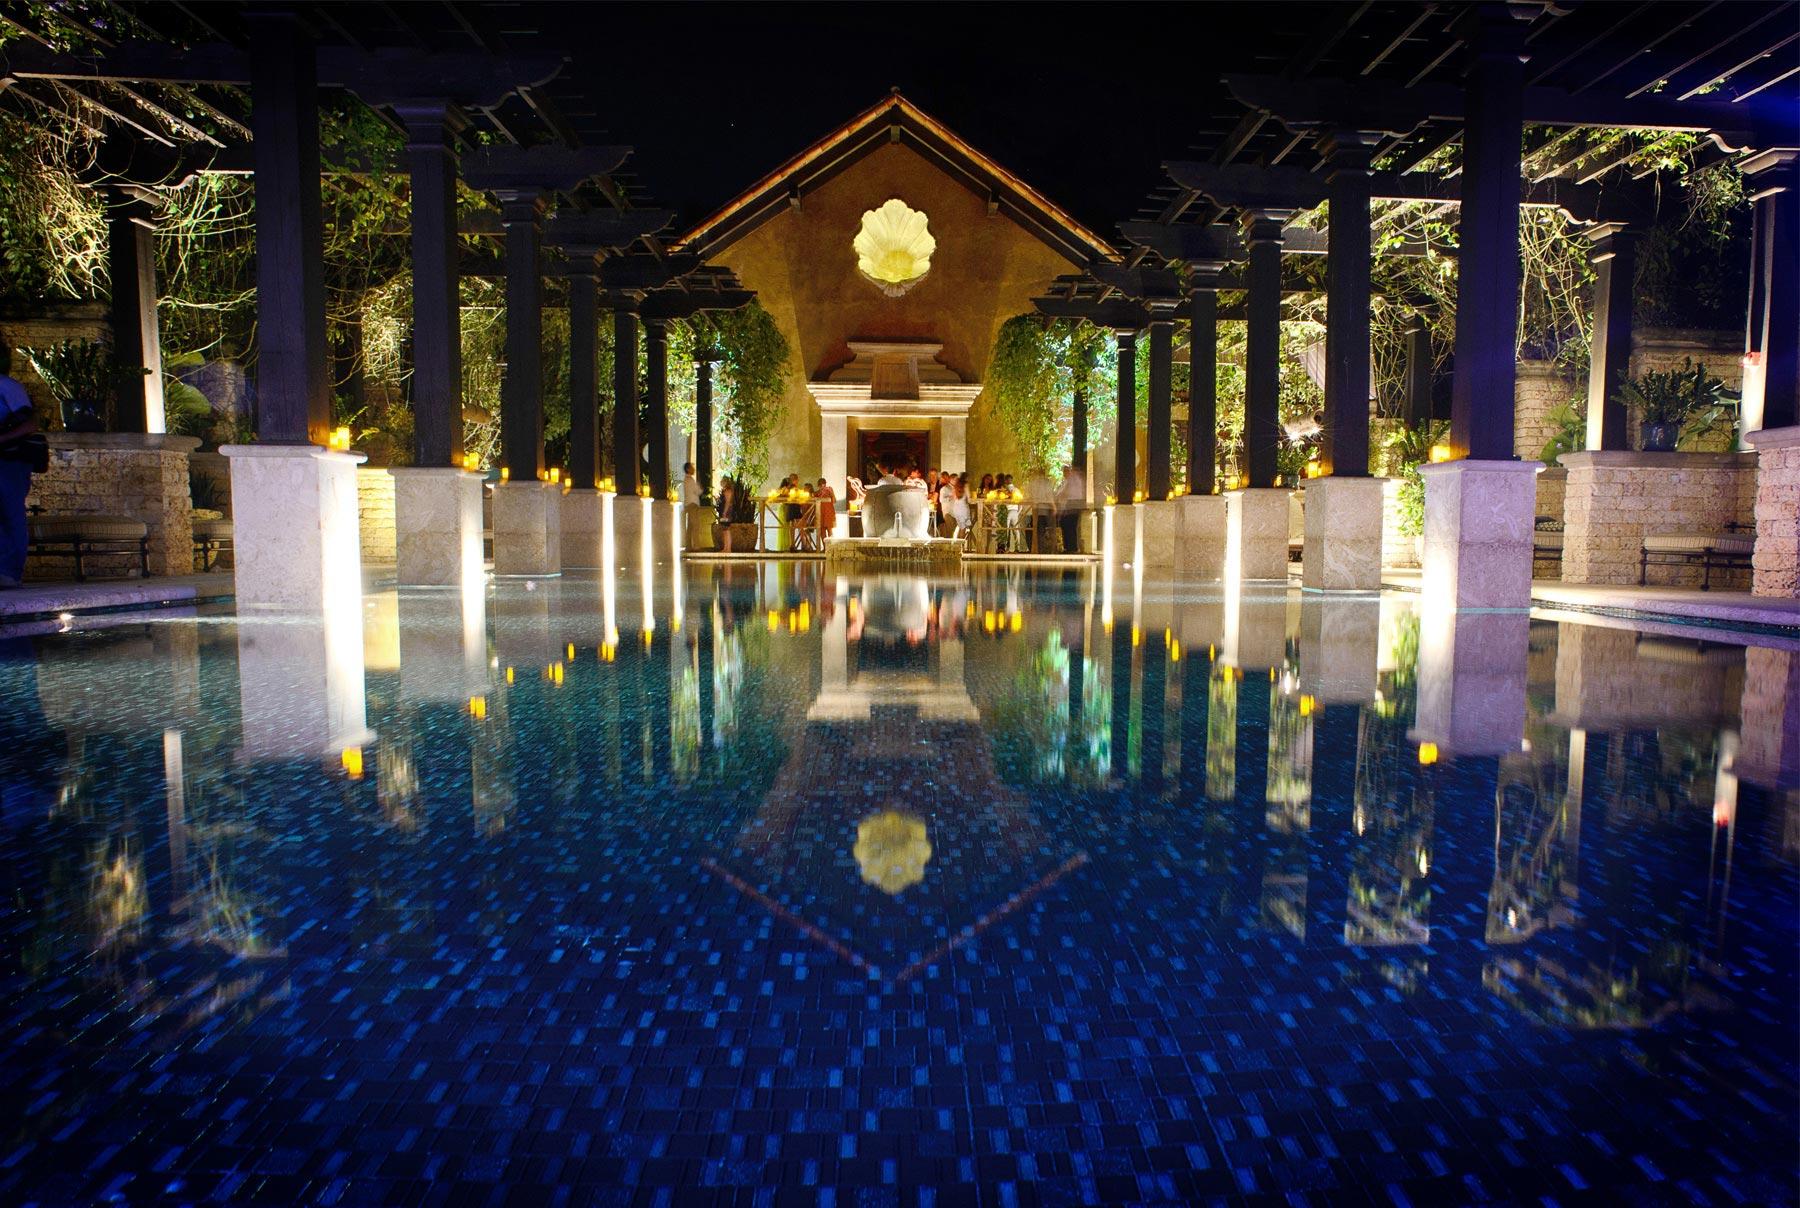 03-Puerto-Rico-Wedding-Photography-by-Vick-Photography-Destination-Wedding-Island-Tropical-Paradise-Resort-Chanel-and-Sam.jpg